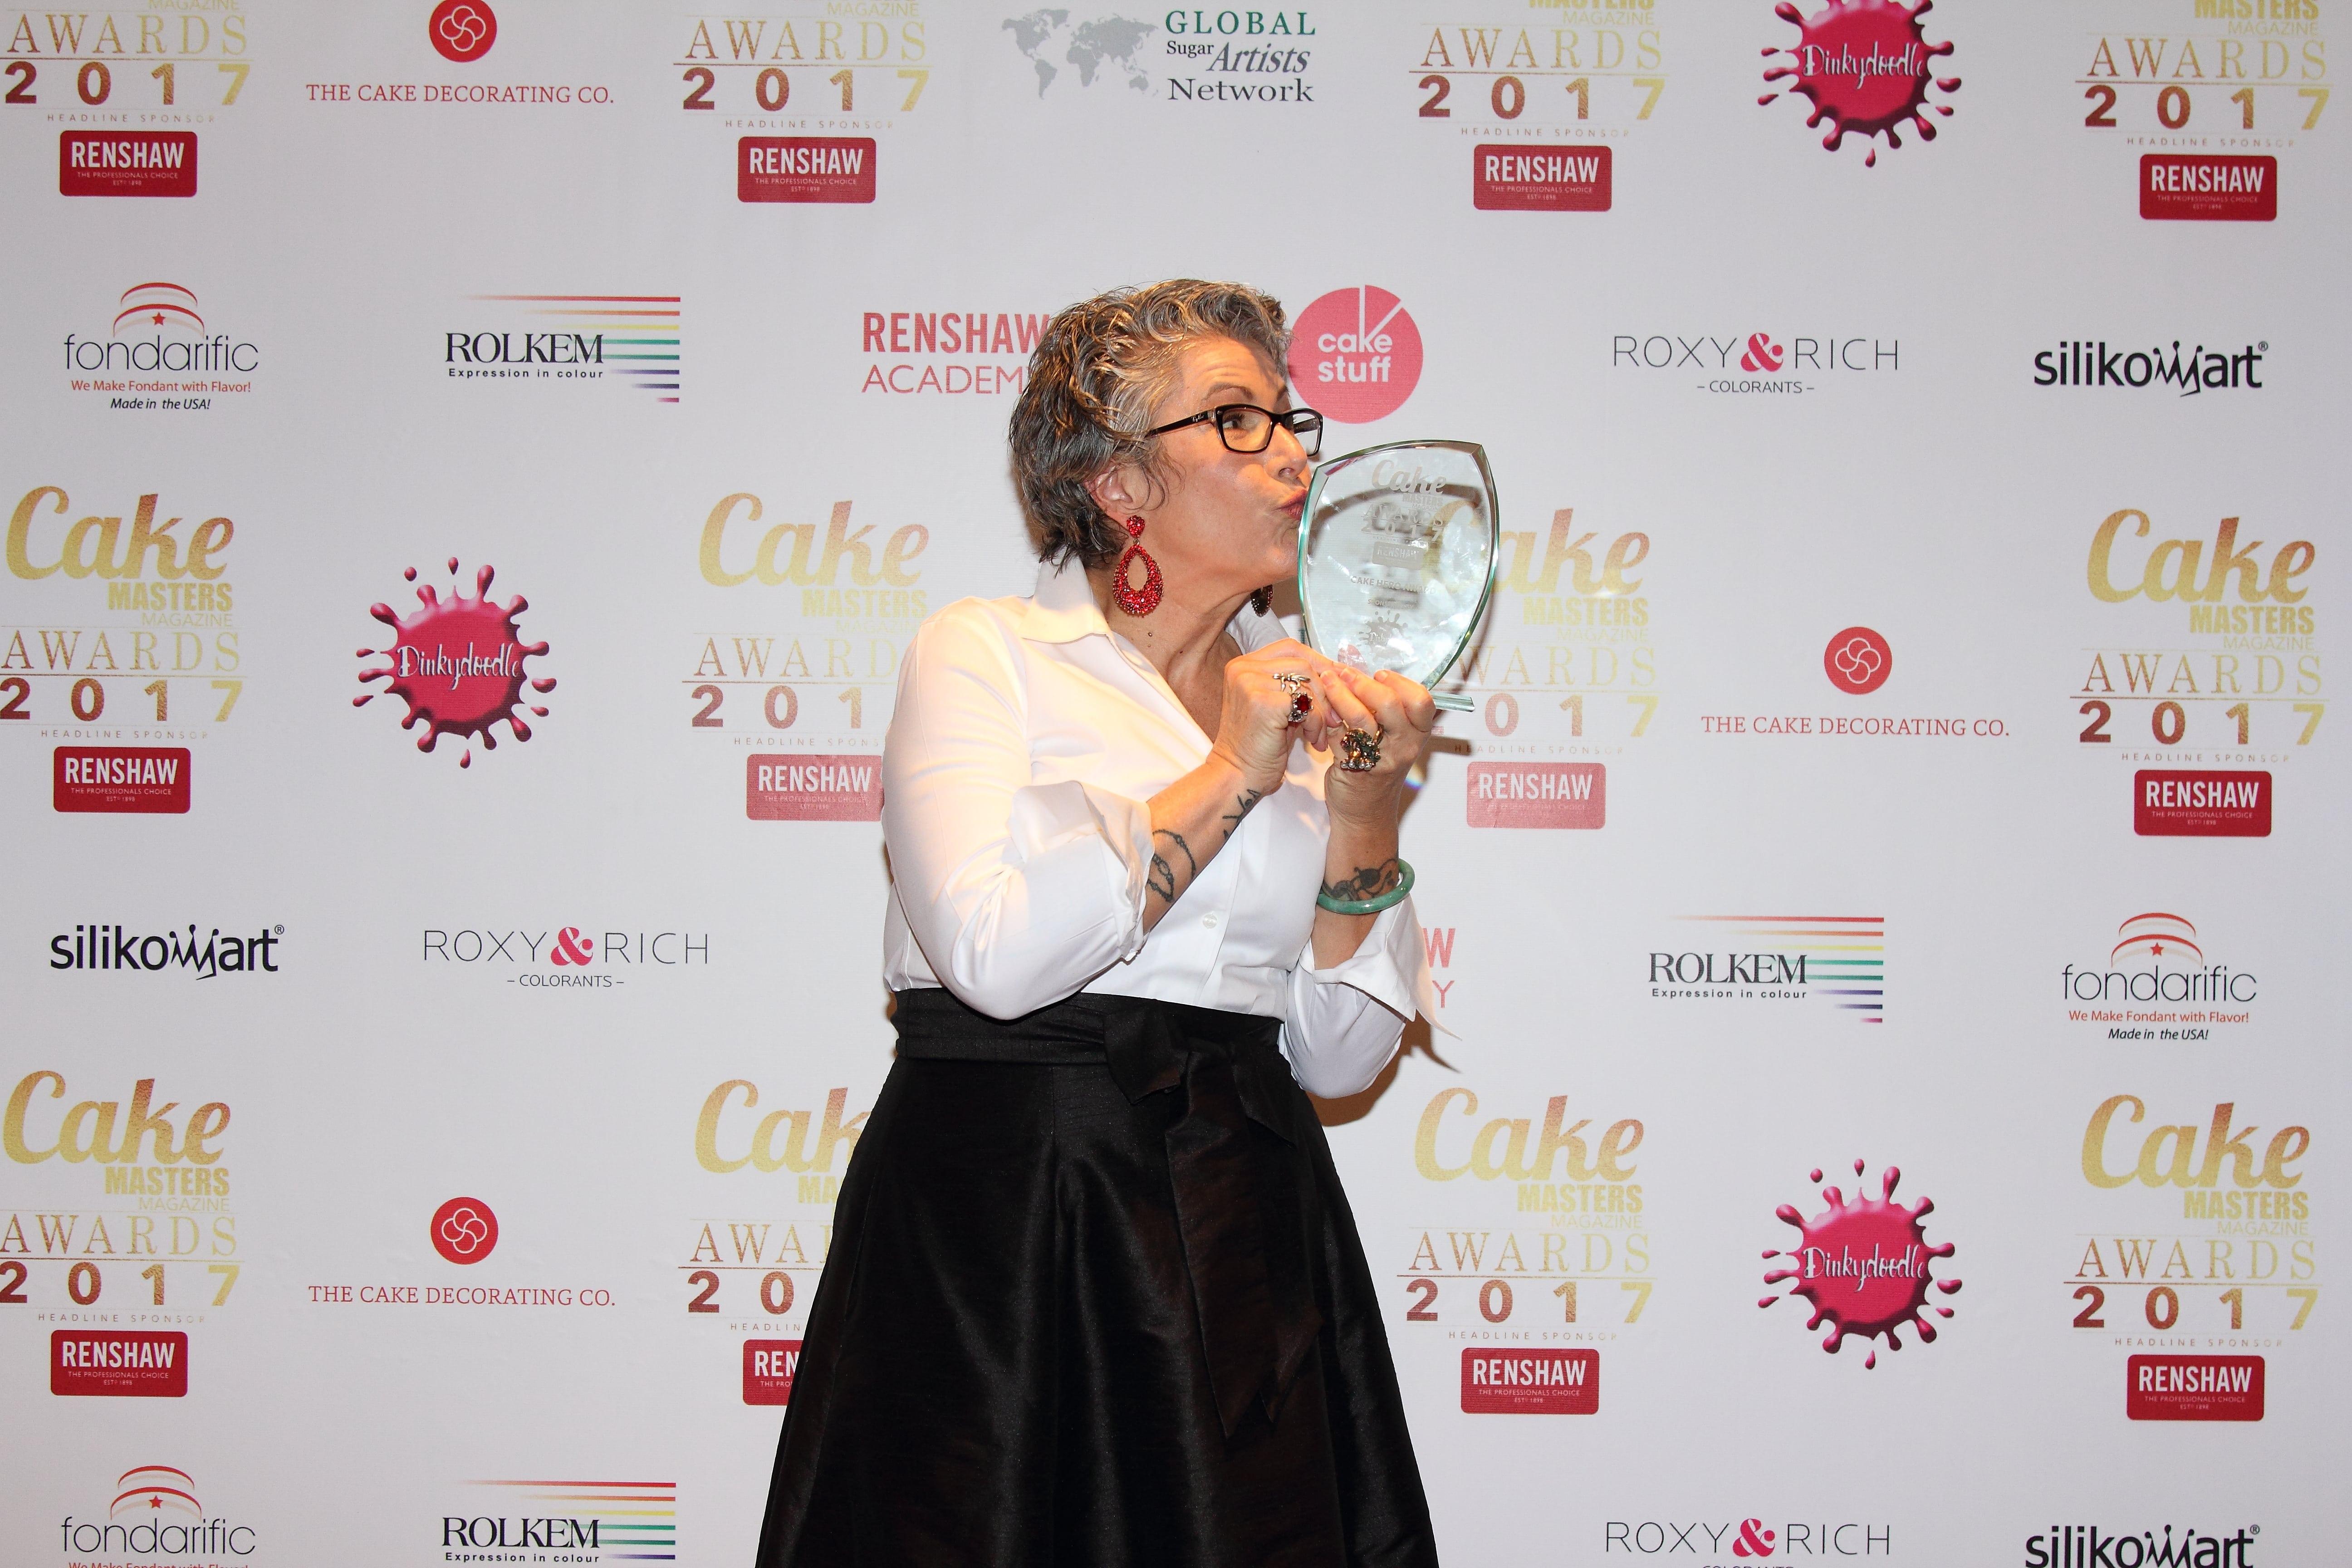 cake hero award